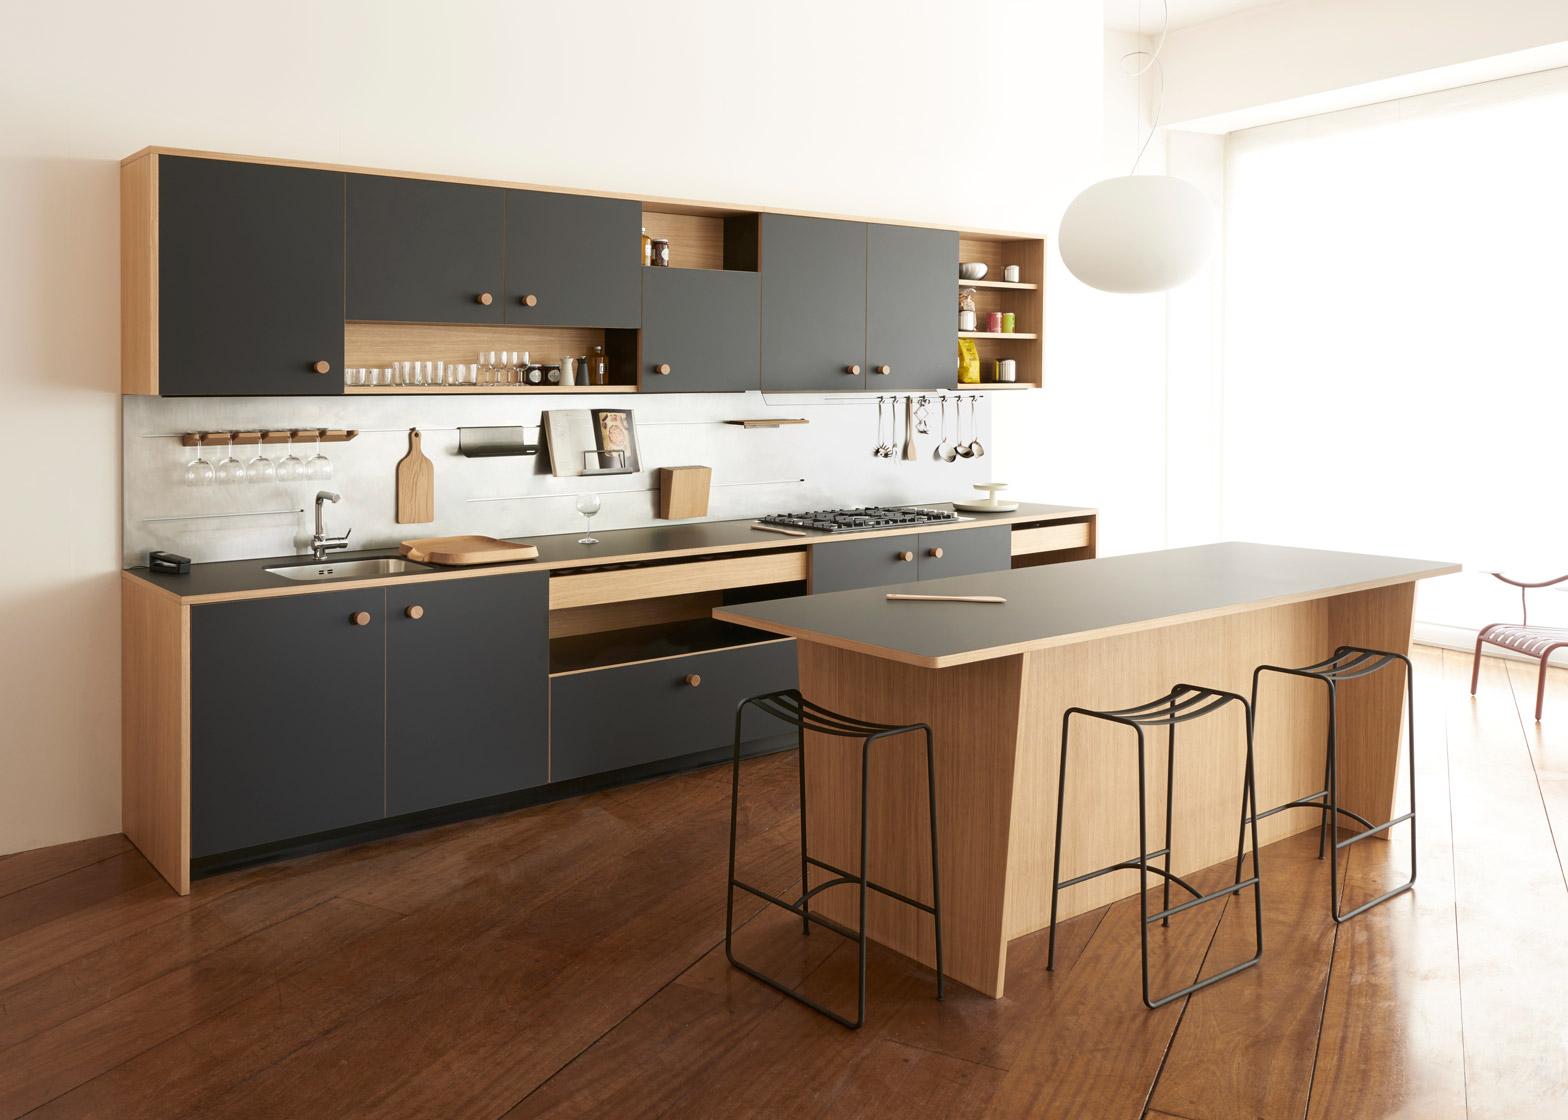 lepic kitchen design jasper morrison versatile schiffini wood laminate dezeen 1568 9